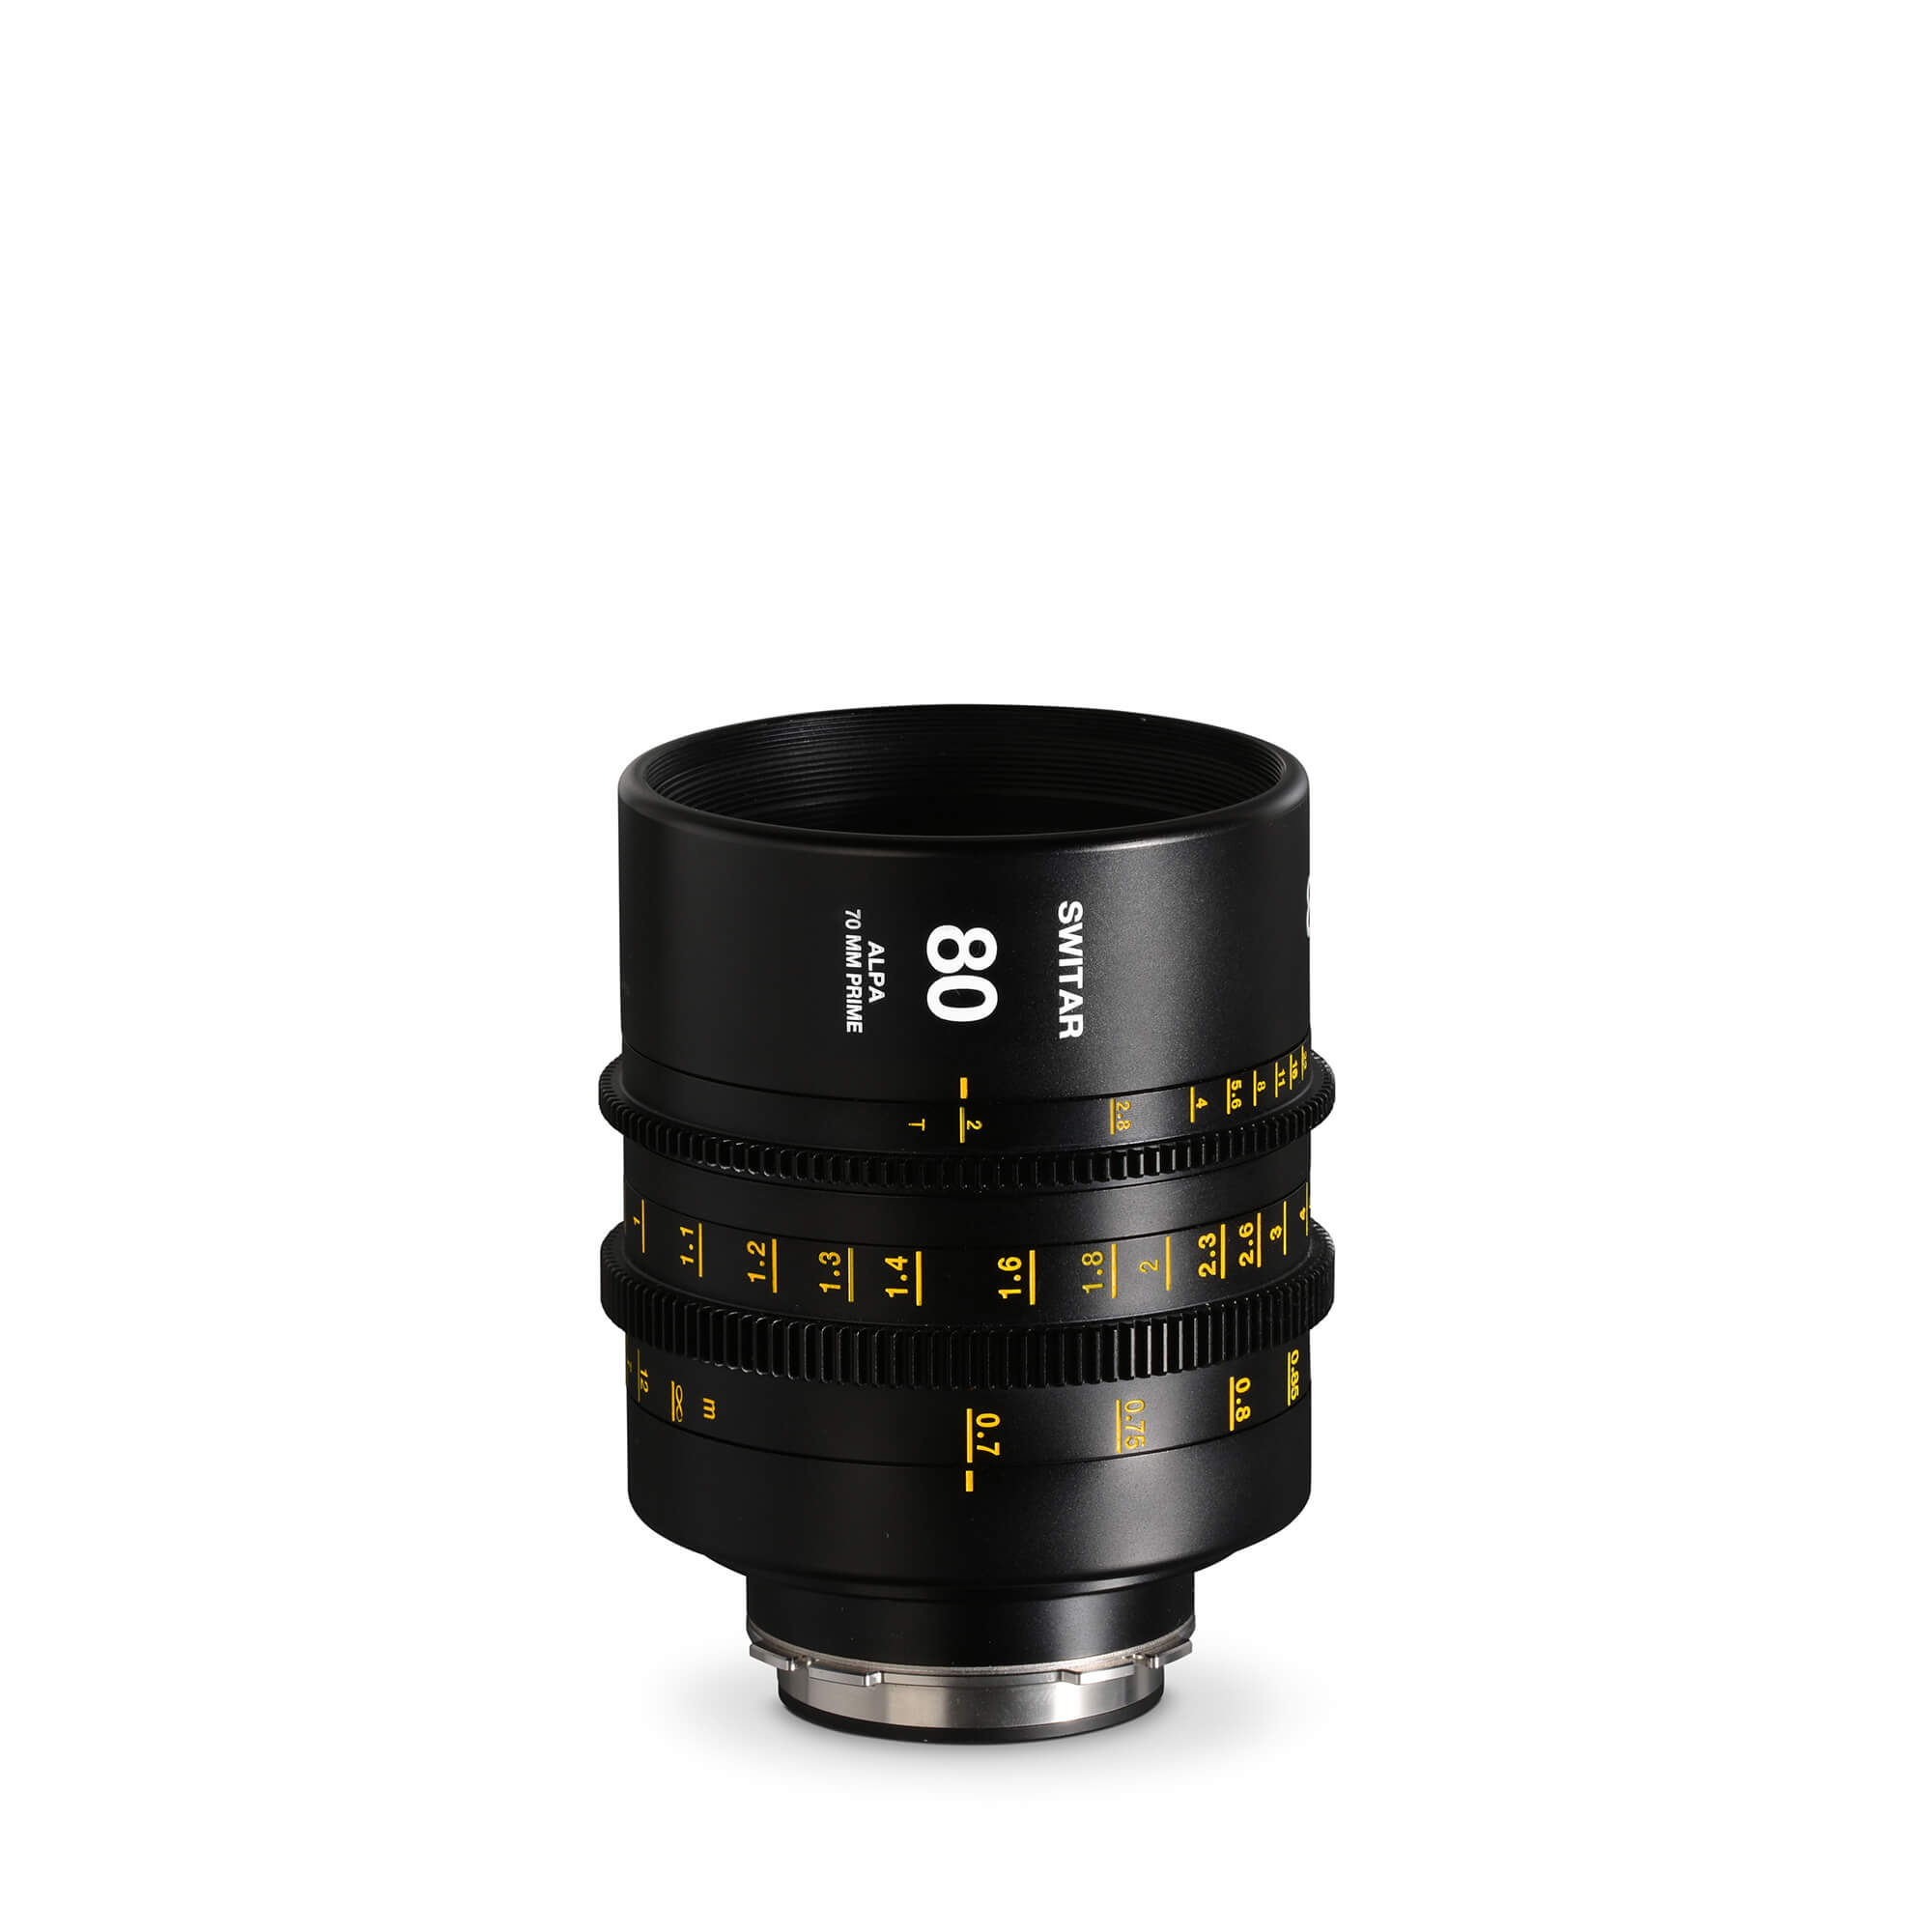 ALPA Switar 2.0/80 mm Cine Prime IC 70 mm - feet